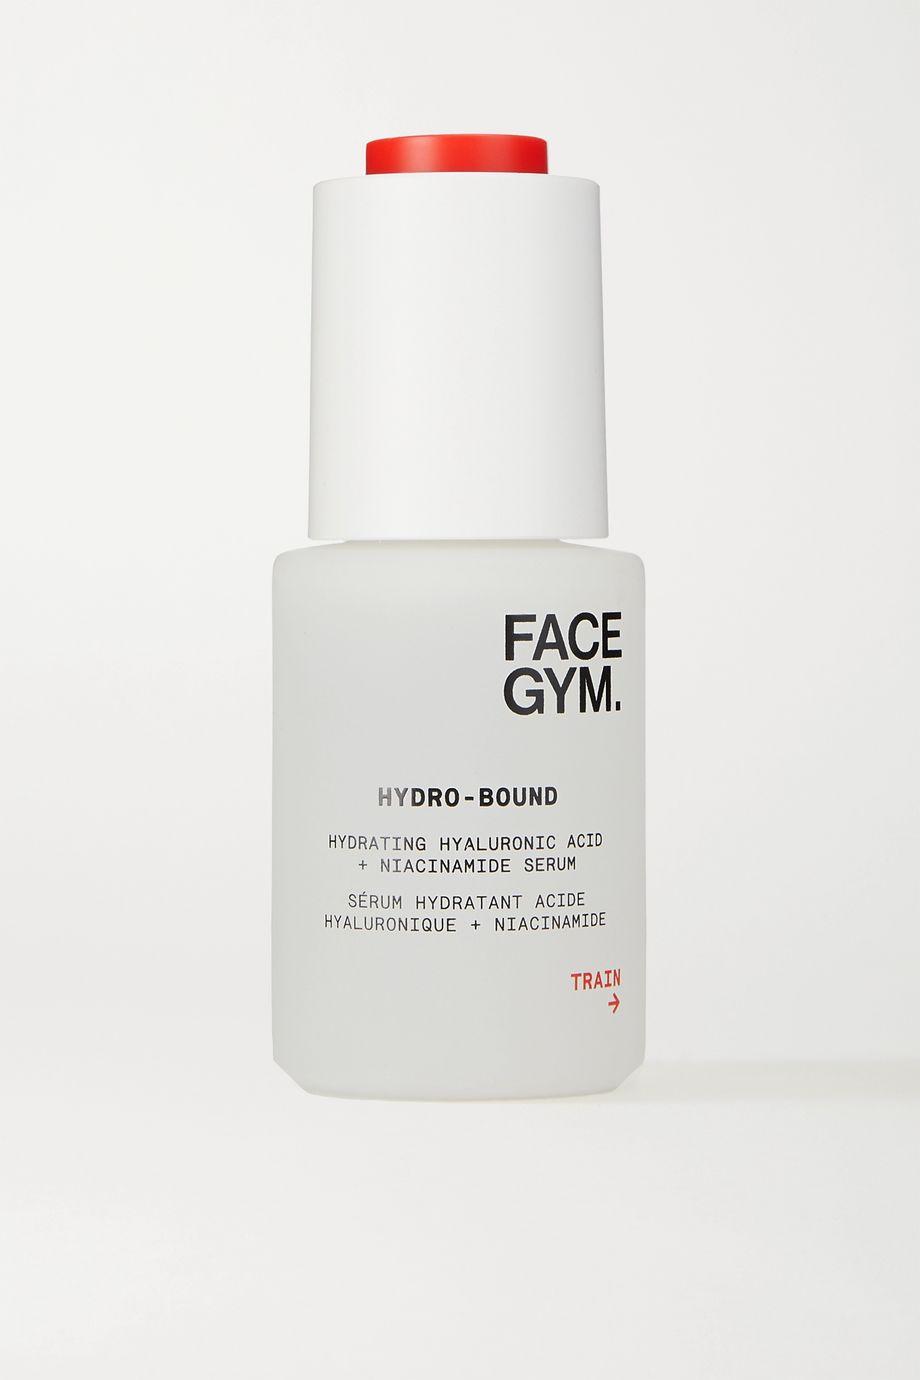 FaceGym Hydro-bound Hydrating Hyaluronic Acid + Niacinamide Serum, 30 ml – Serum